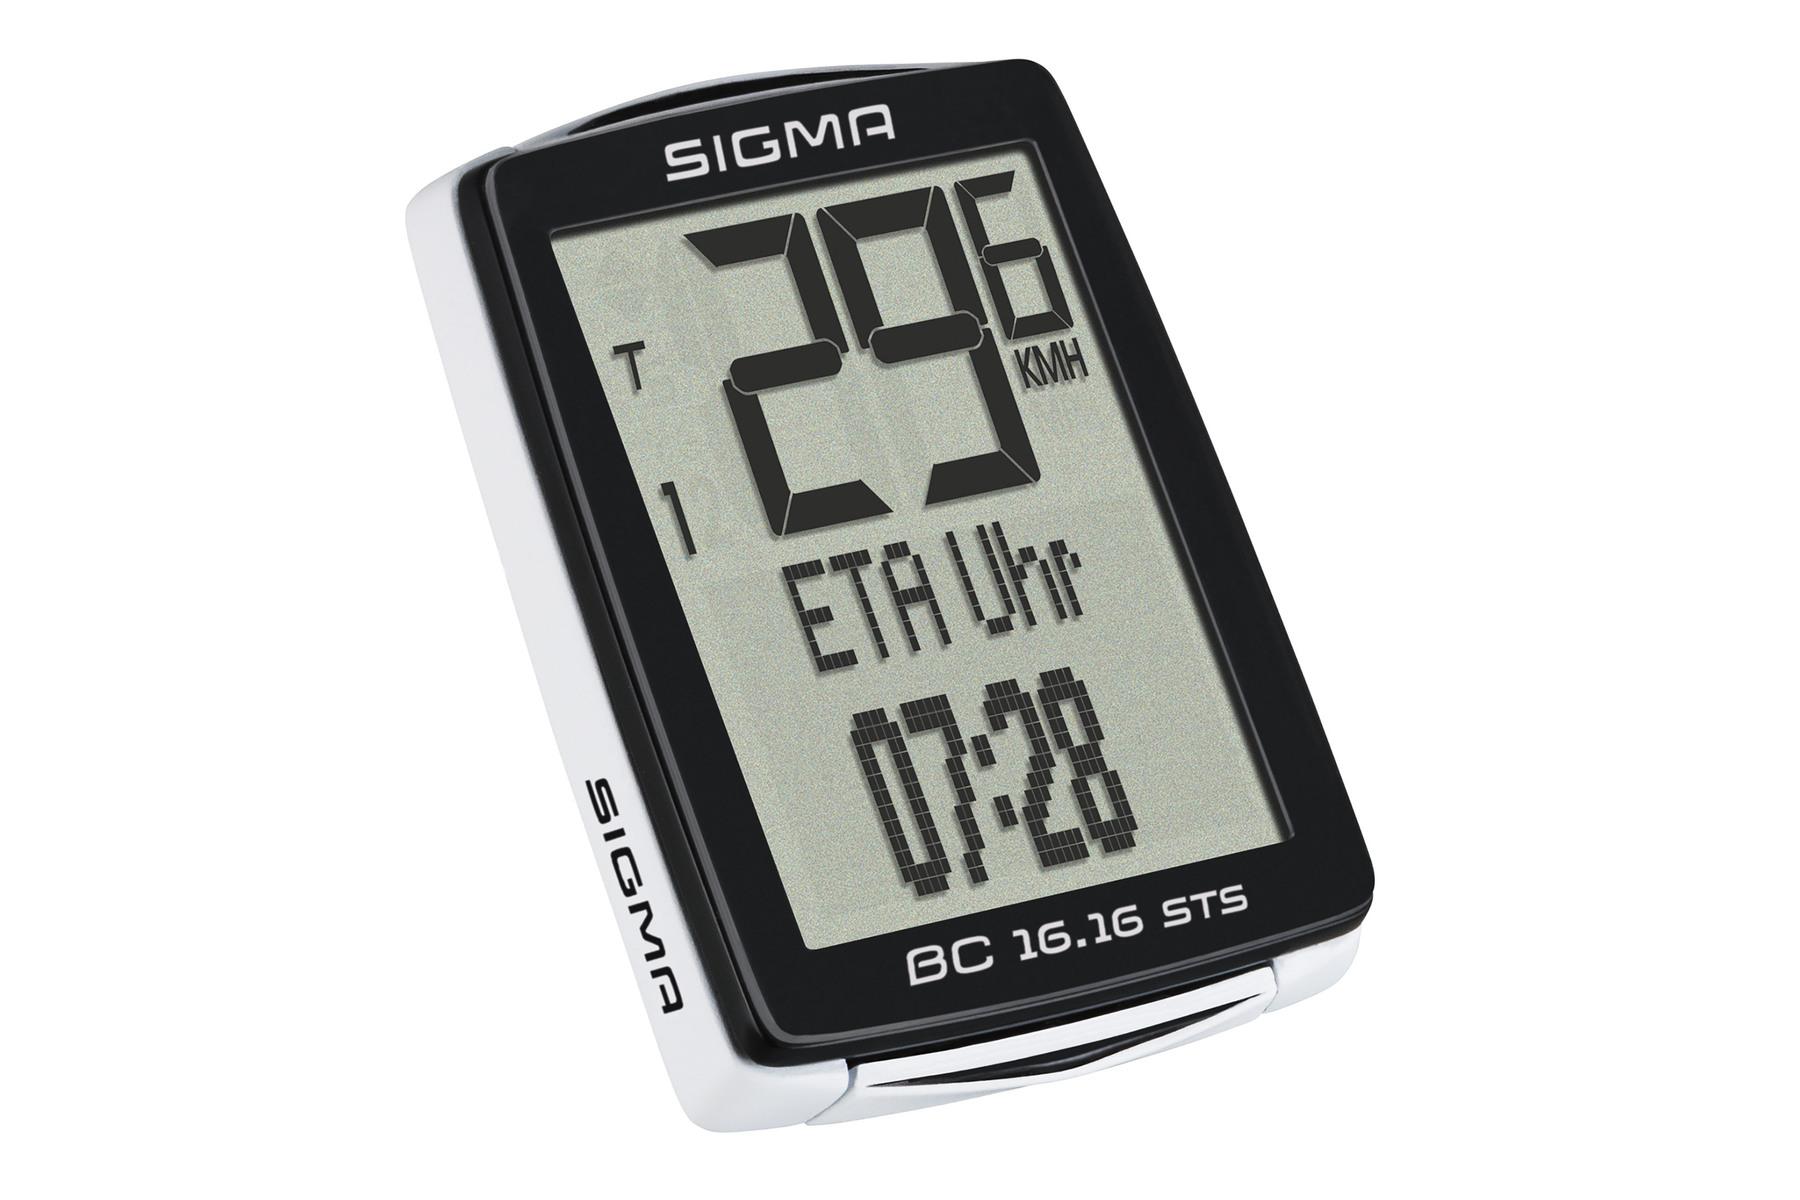 Sigma BC 16.16 STS Fahrradcomputer -kabellos-